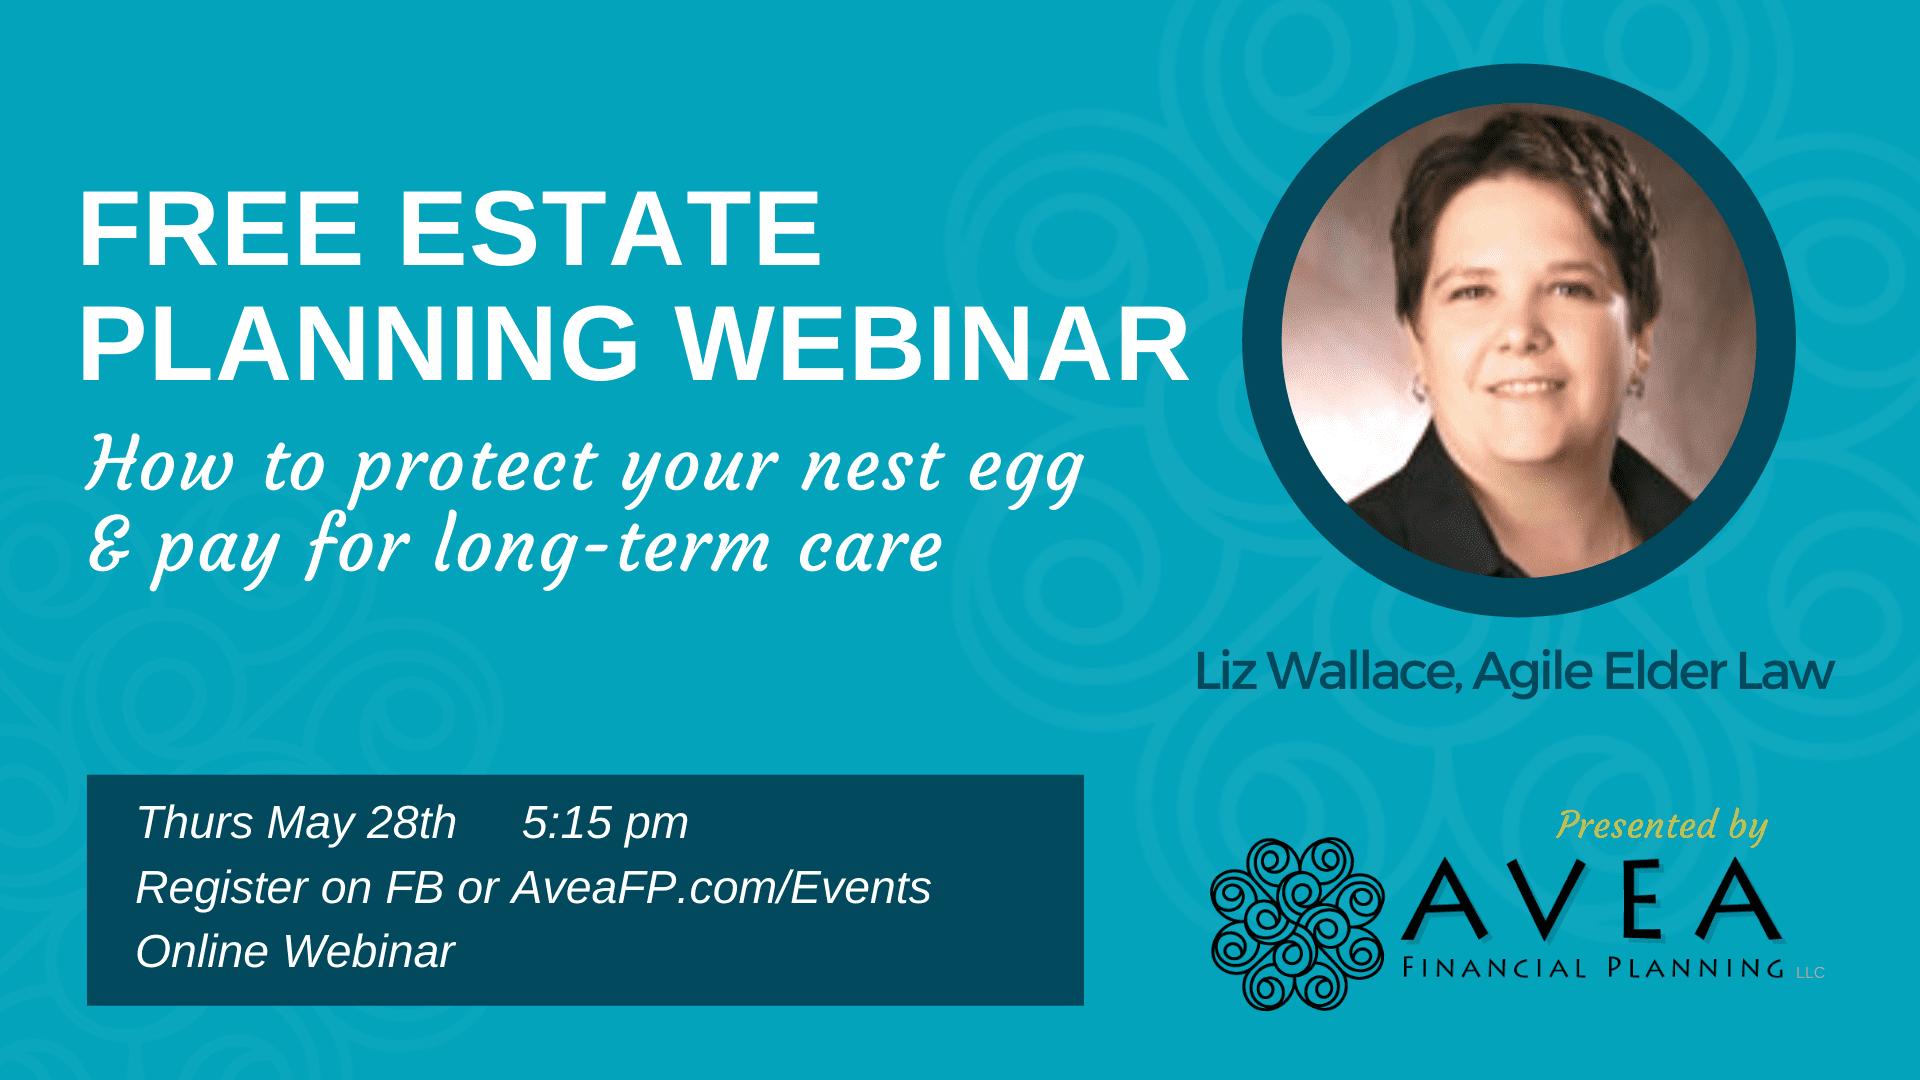 Estate & Long-Term Care Planning